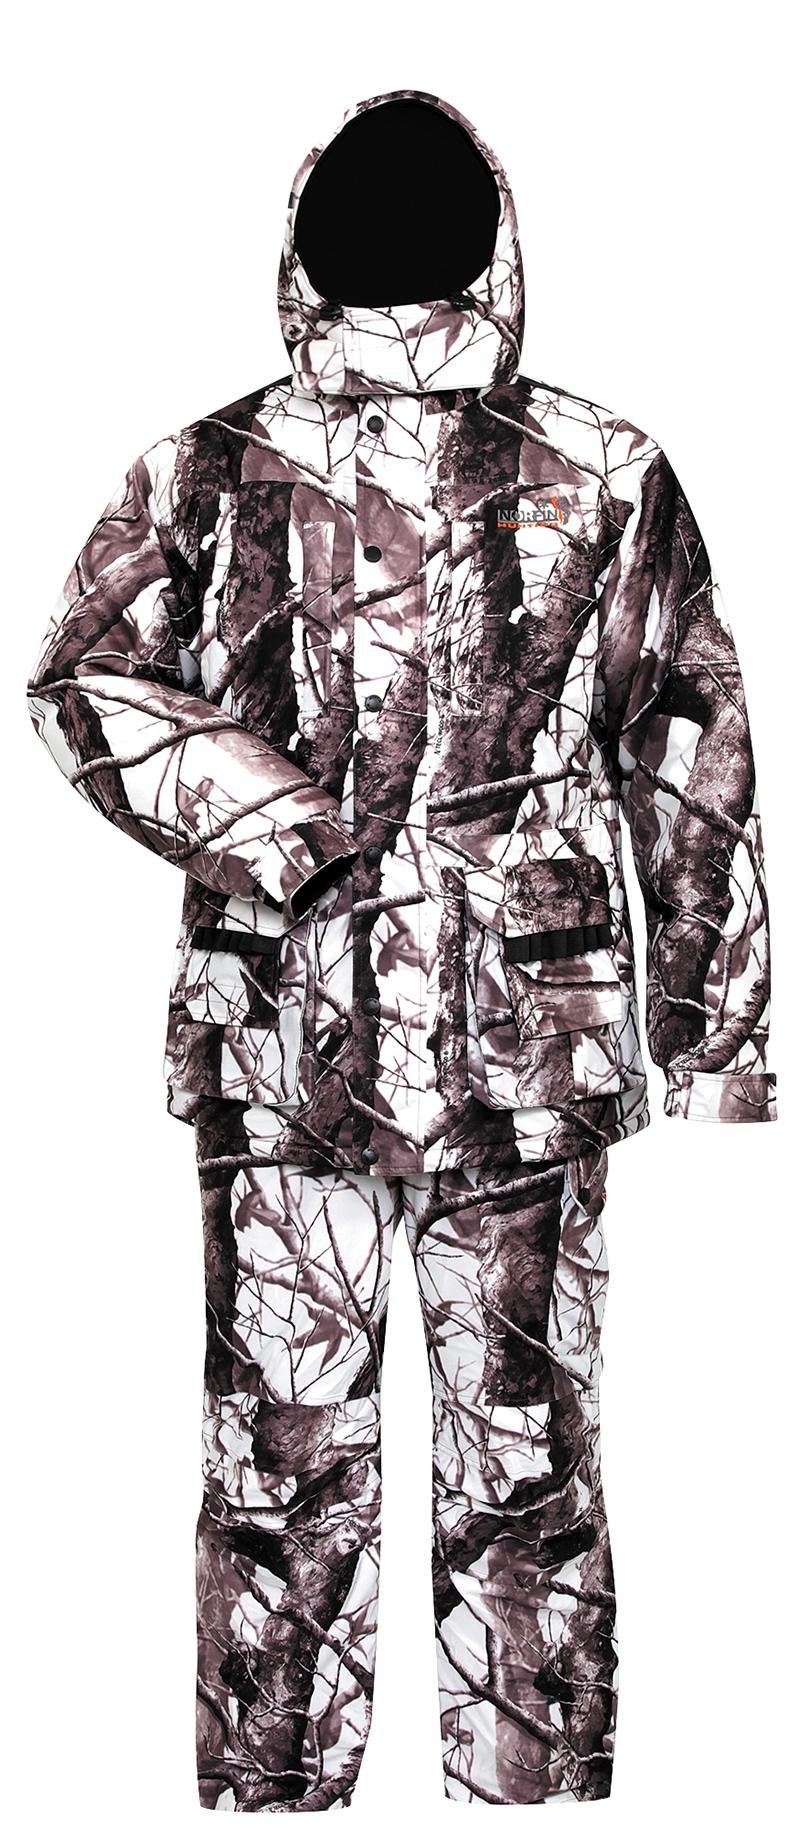 Костюм для охоты Norfin Hunting Wild, snow, S INT, 168-174 см фото